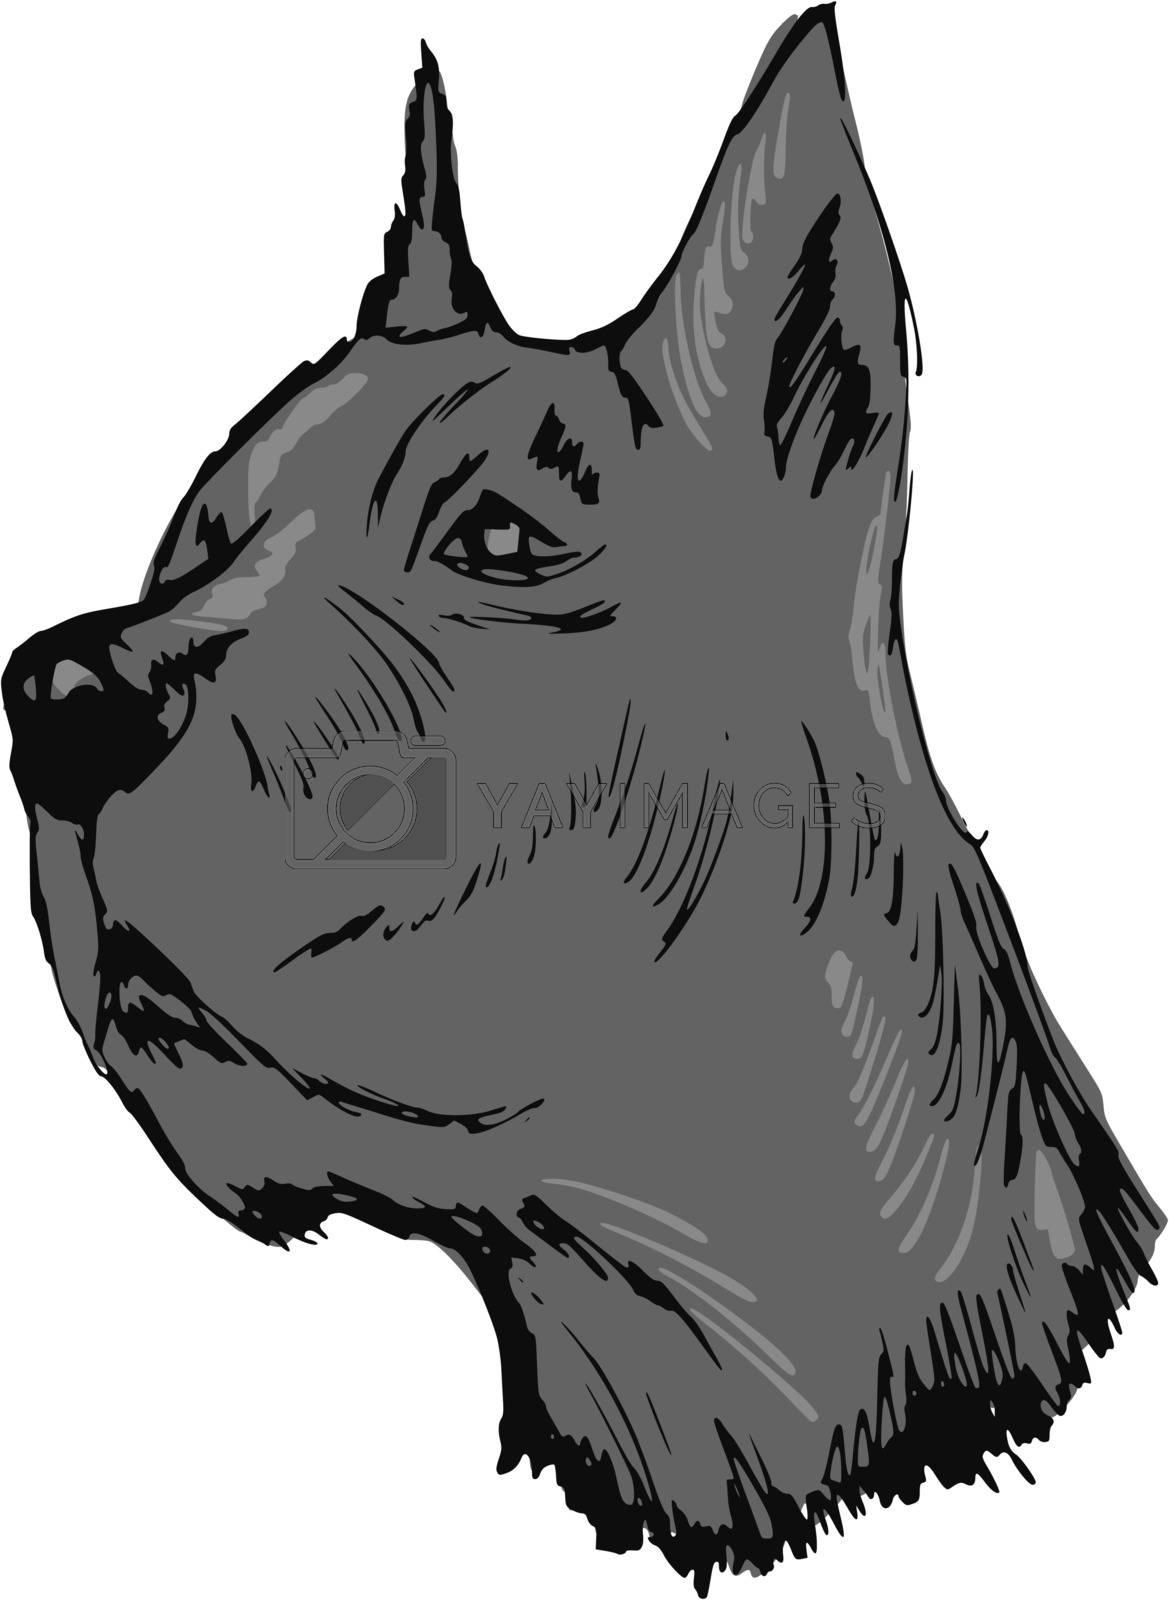 hand drawn, sketch, cartoon illustration of great dane